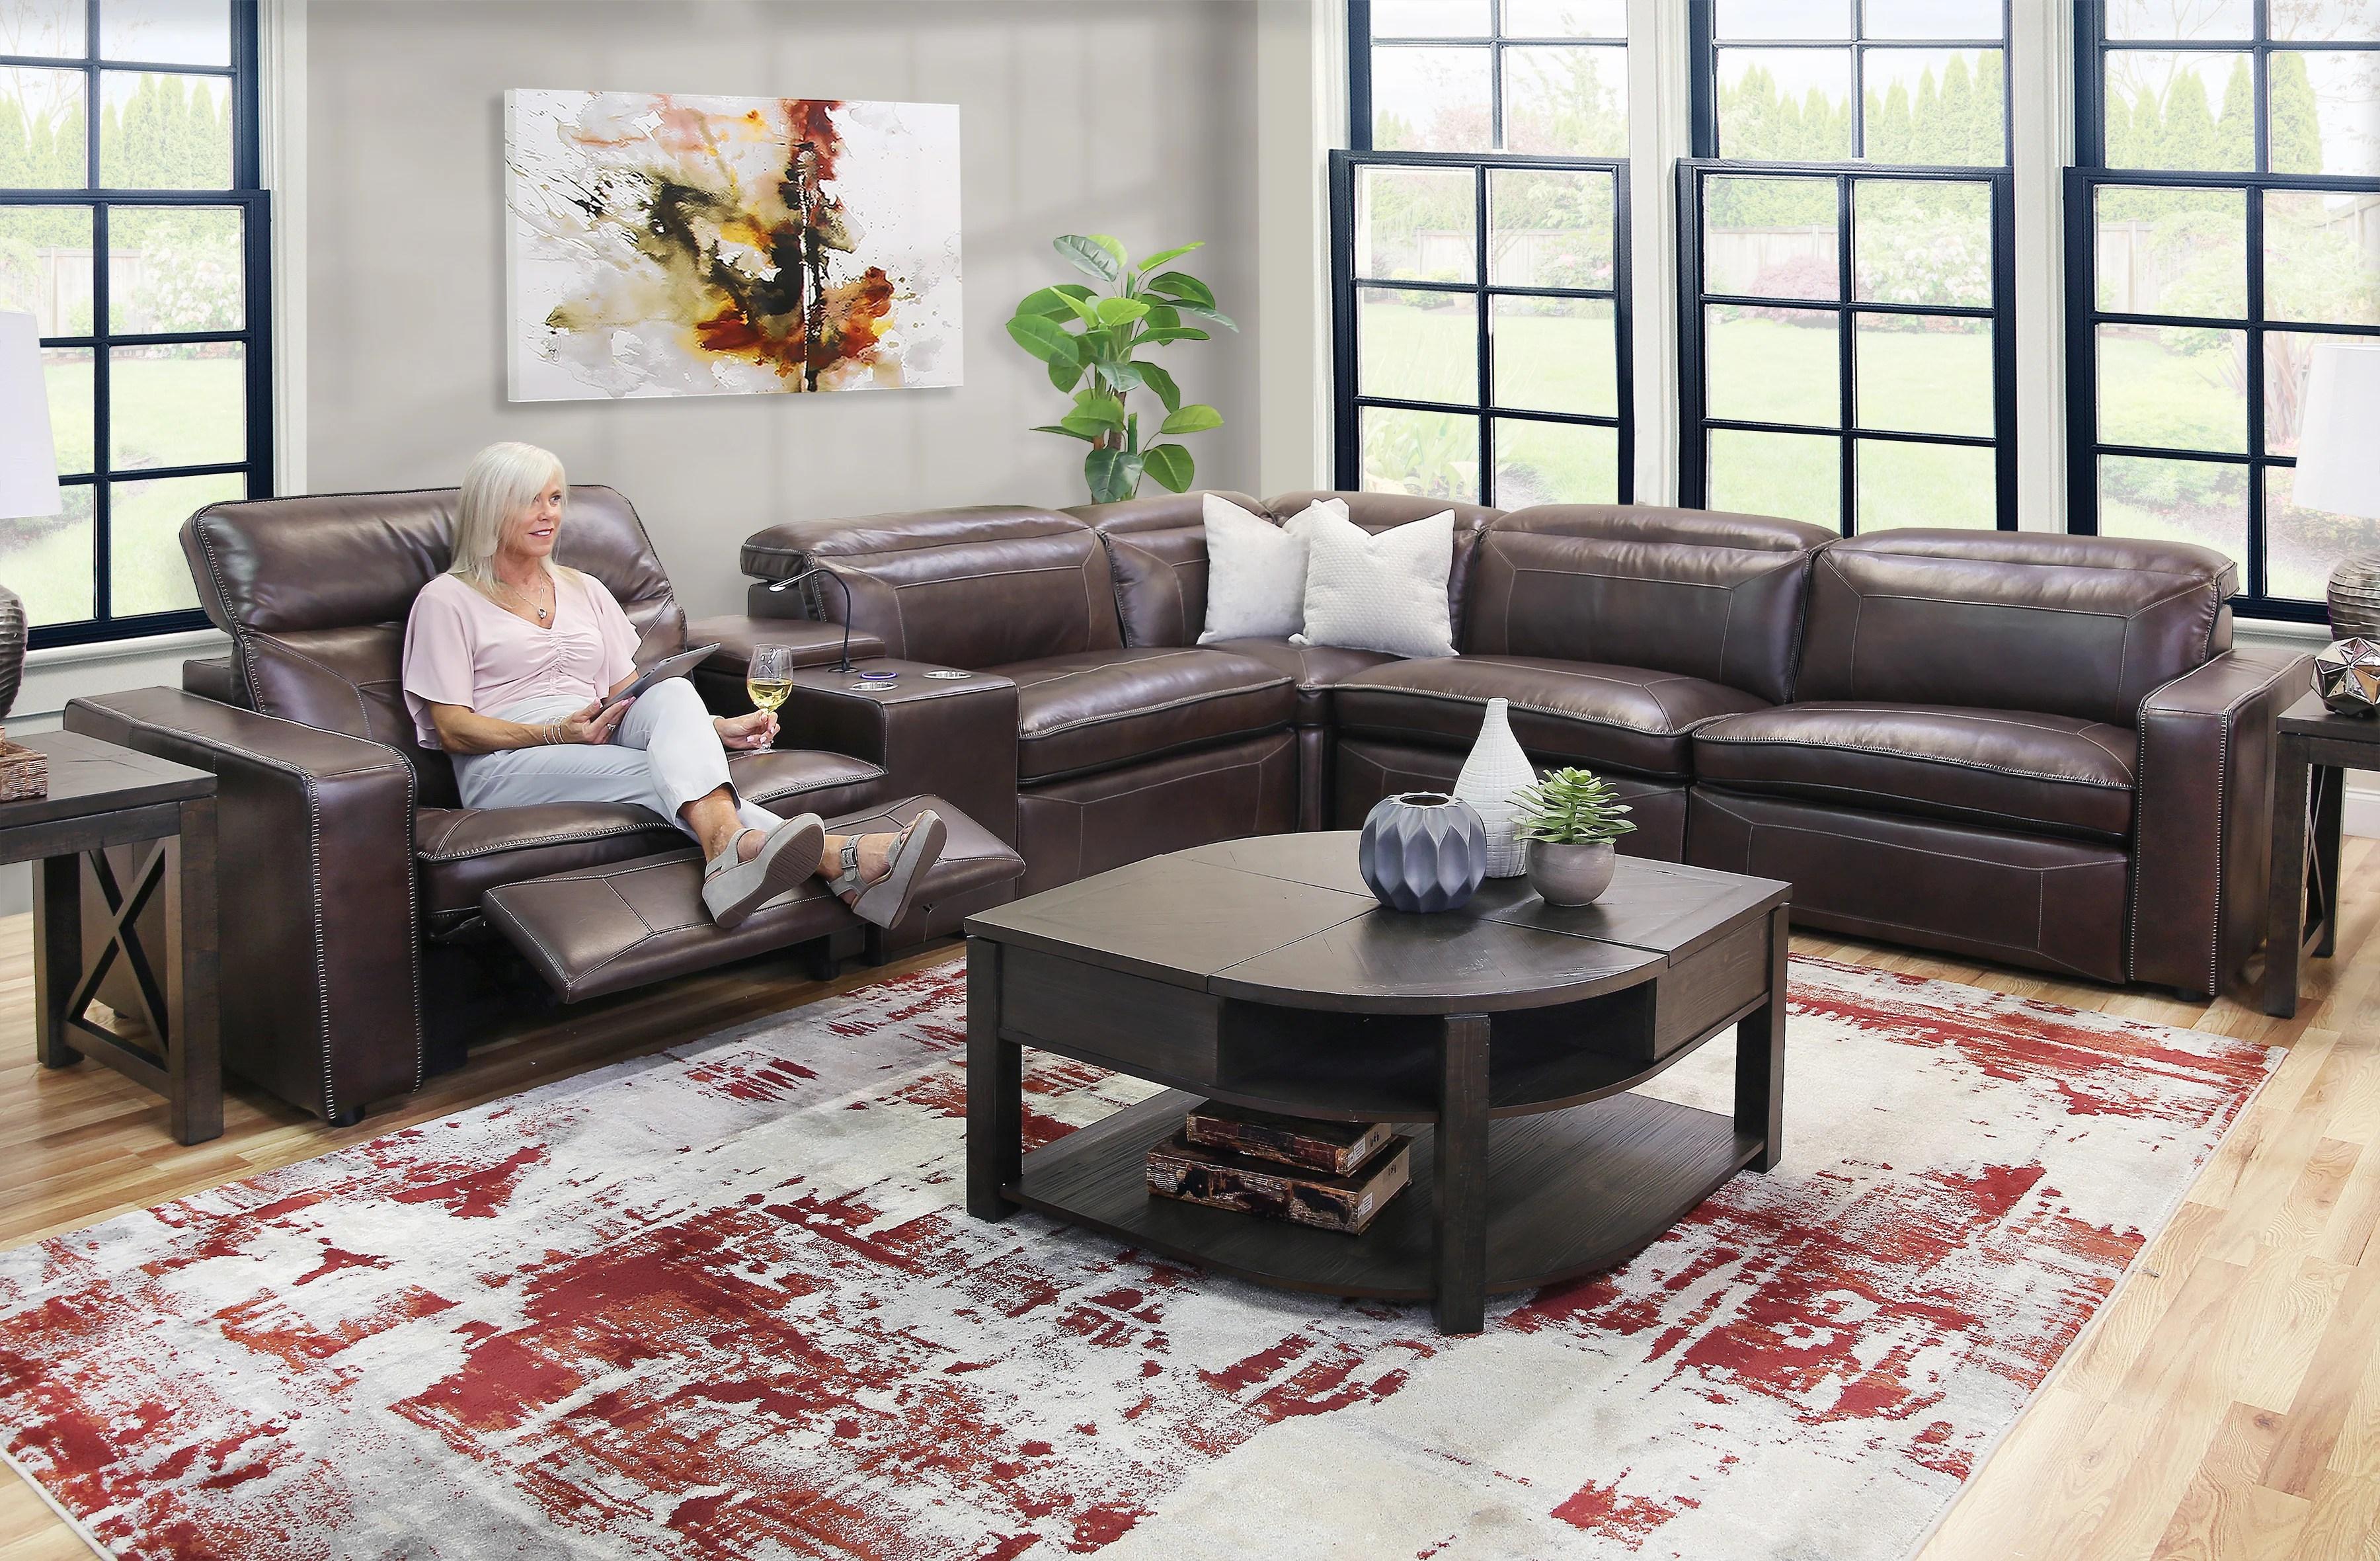 dorado 6 piece leather power reclining sectional sofa